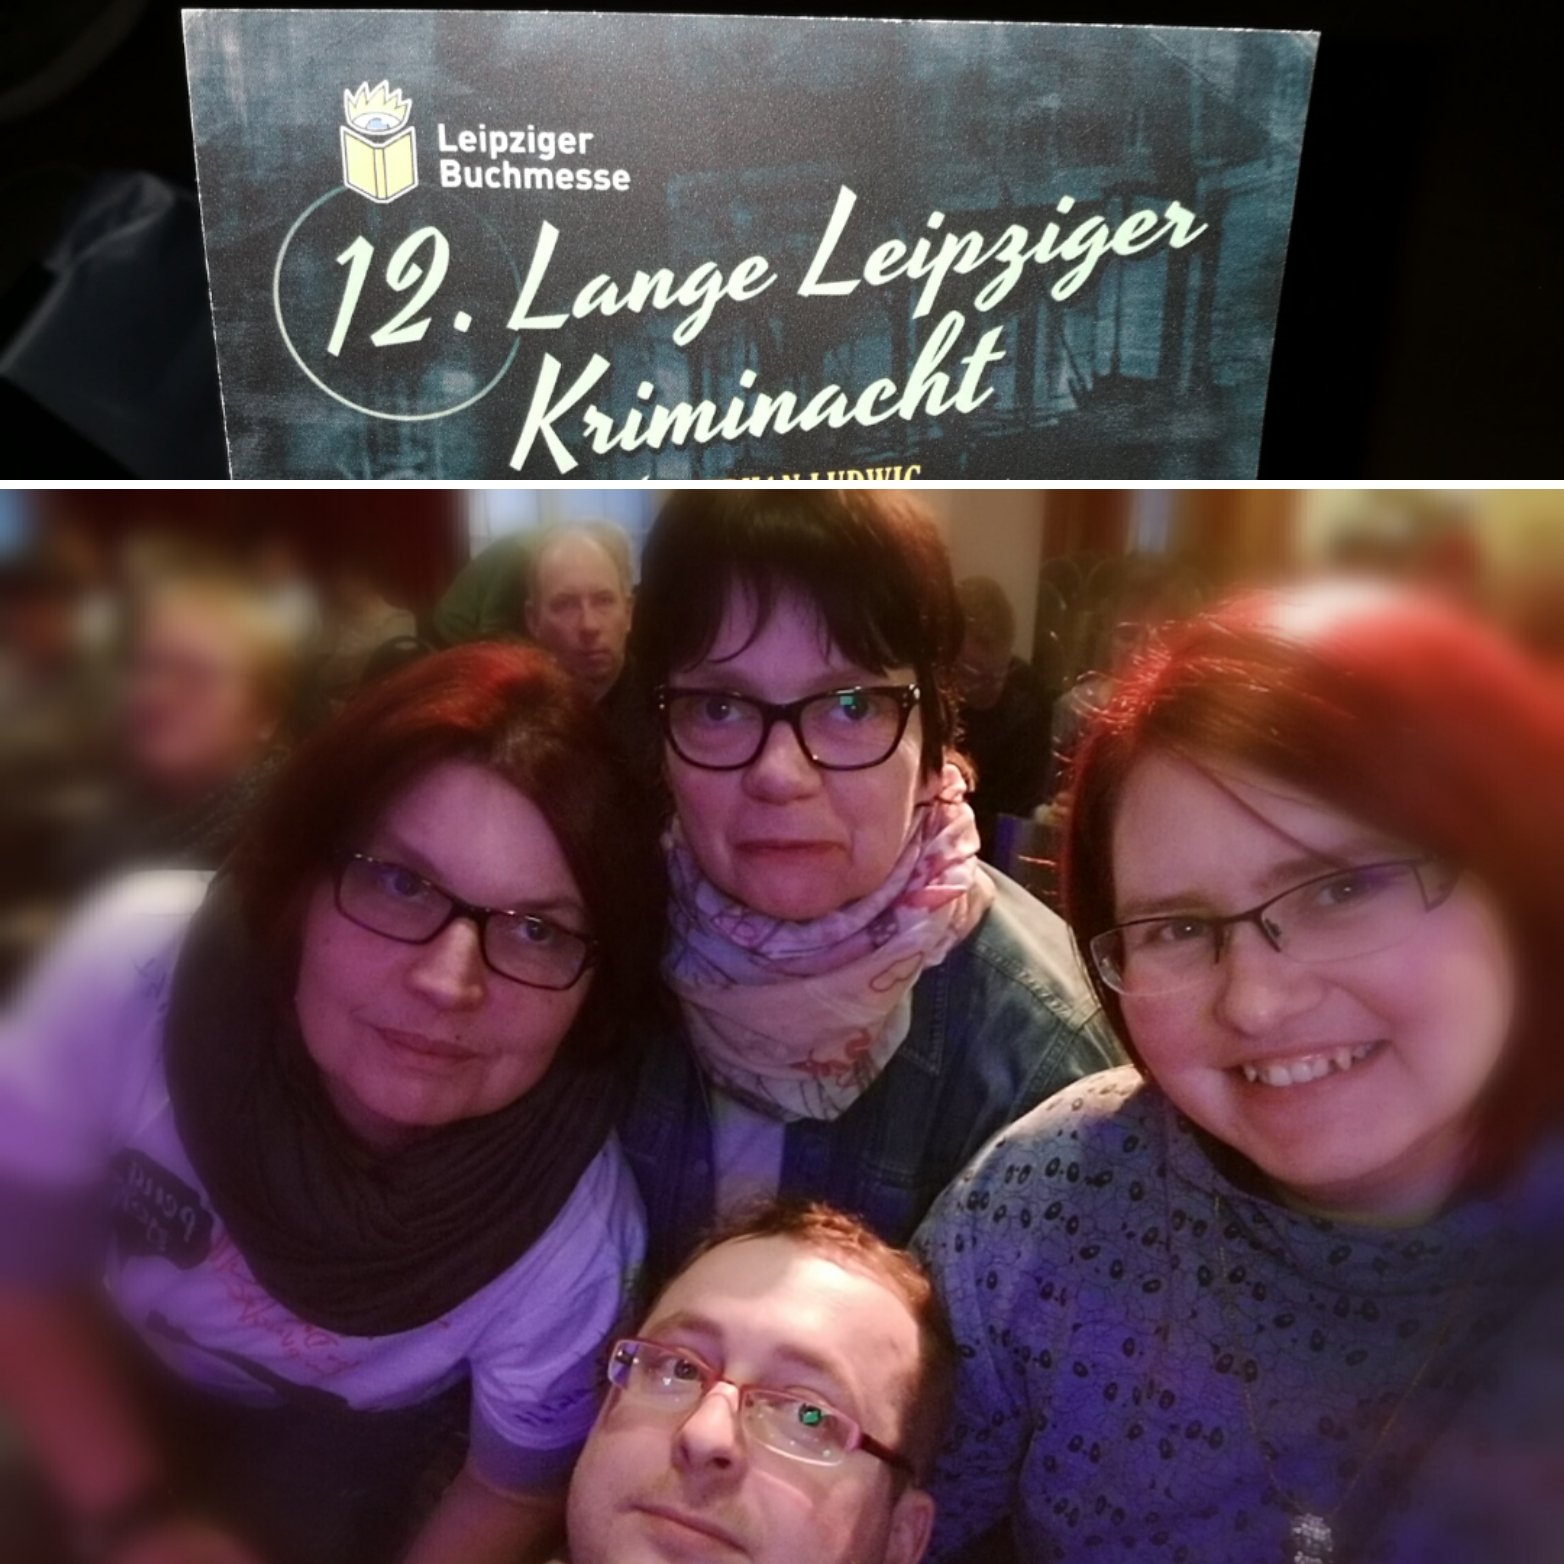 12. Lange Leipziger Kriminacht